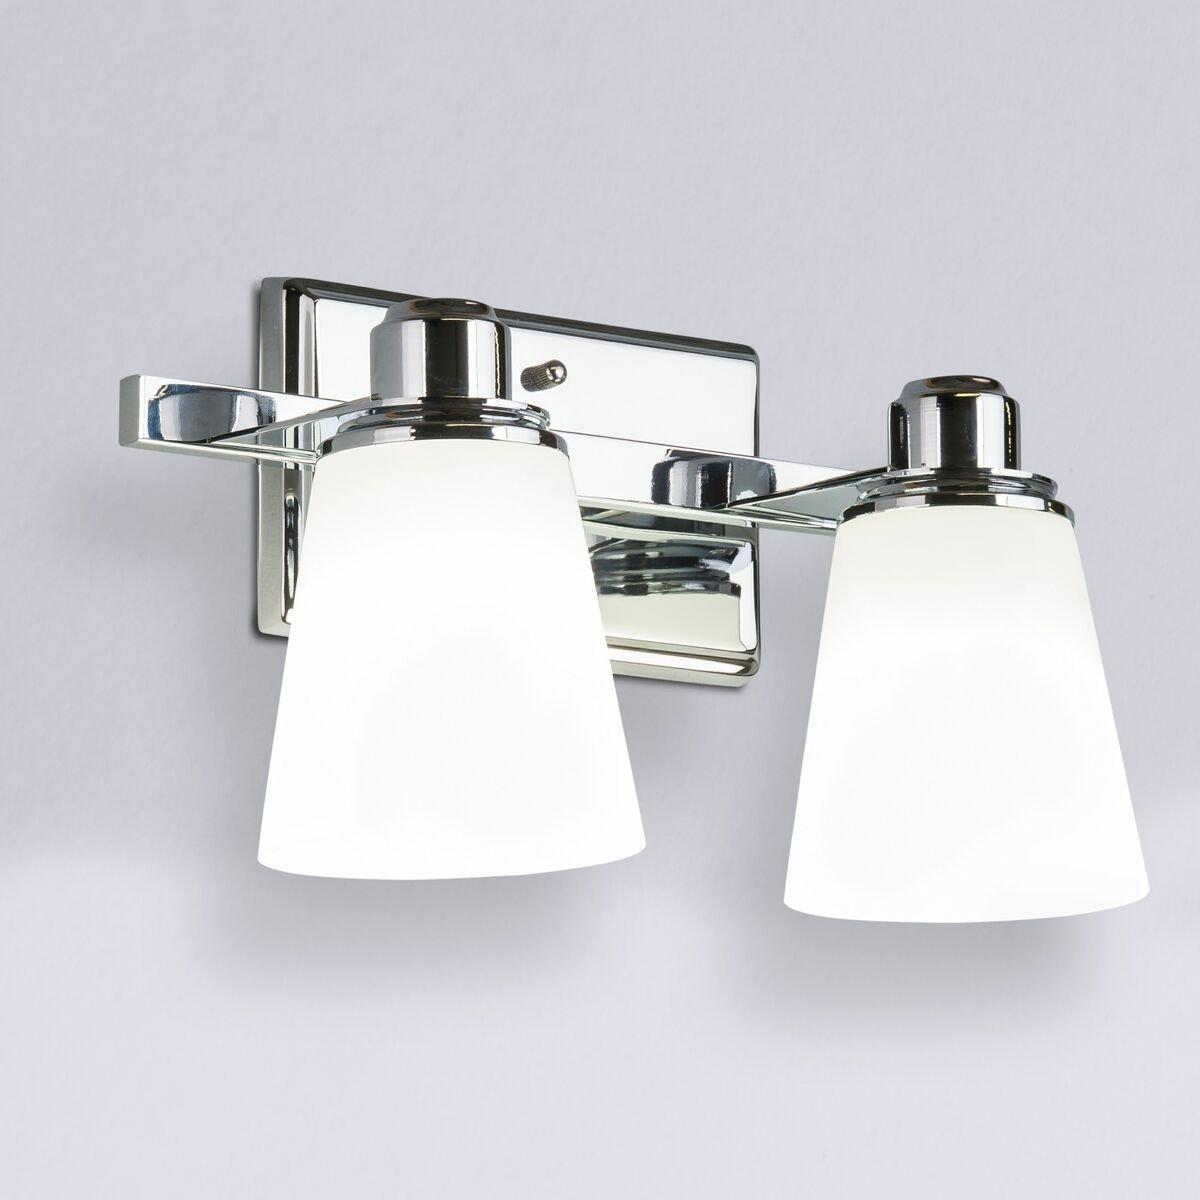 Terracina Two-Light Vanity Sconce Lamp, Polished Chrome with Opal Glass Linea di Liara LL-WL220-2 by Linea di Liara (Image #2)